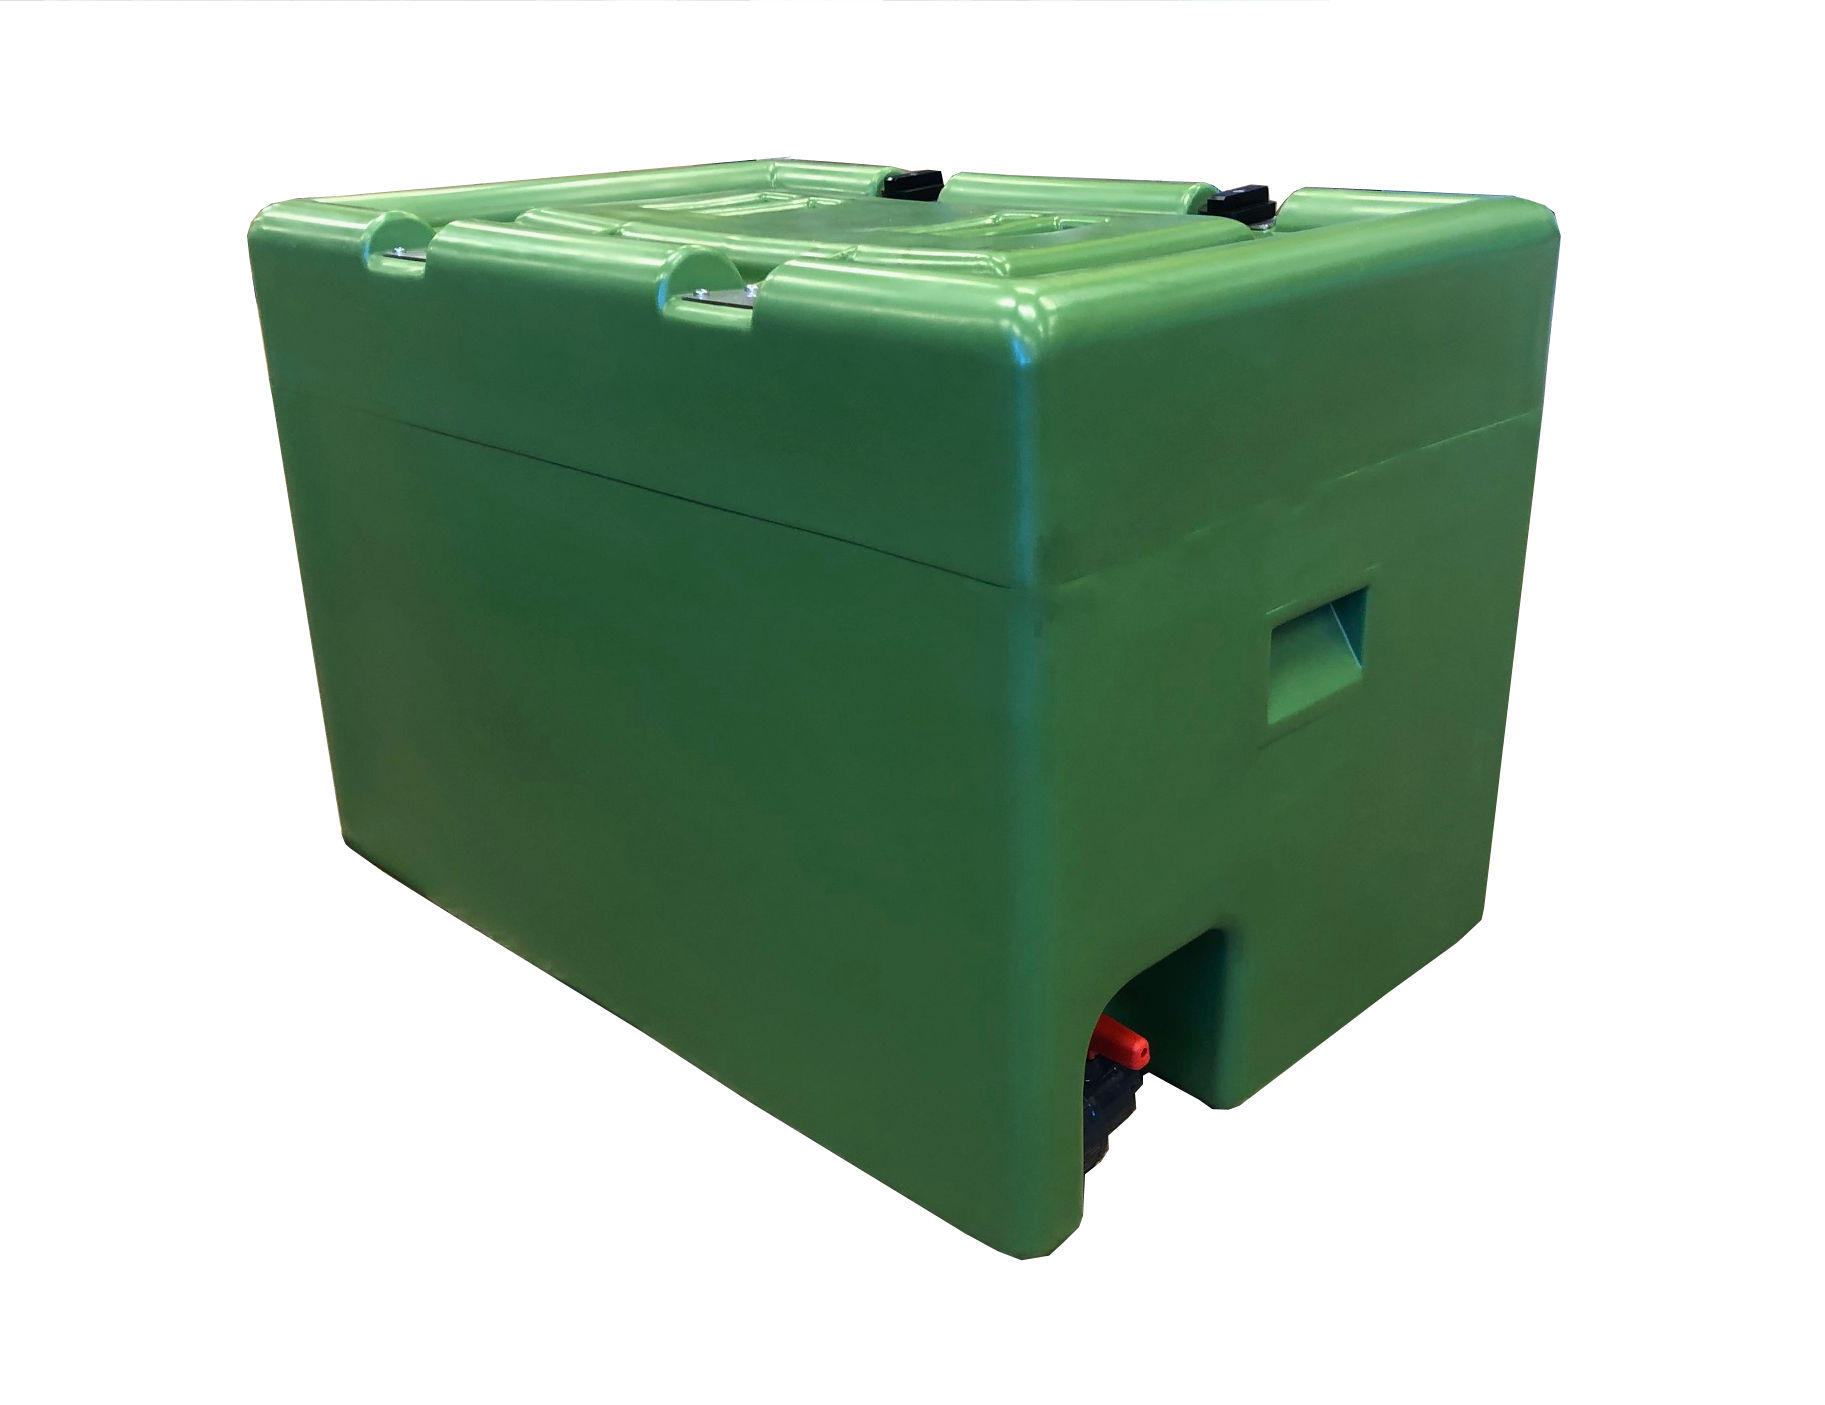 "Linn  transportkar, pe, 600 liter, 1 1/4"" kran, grønn"